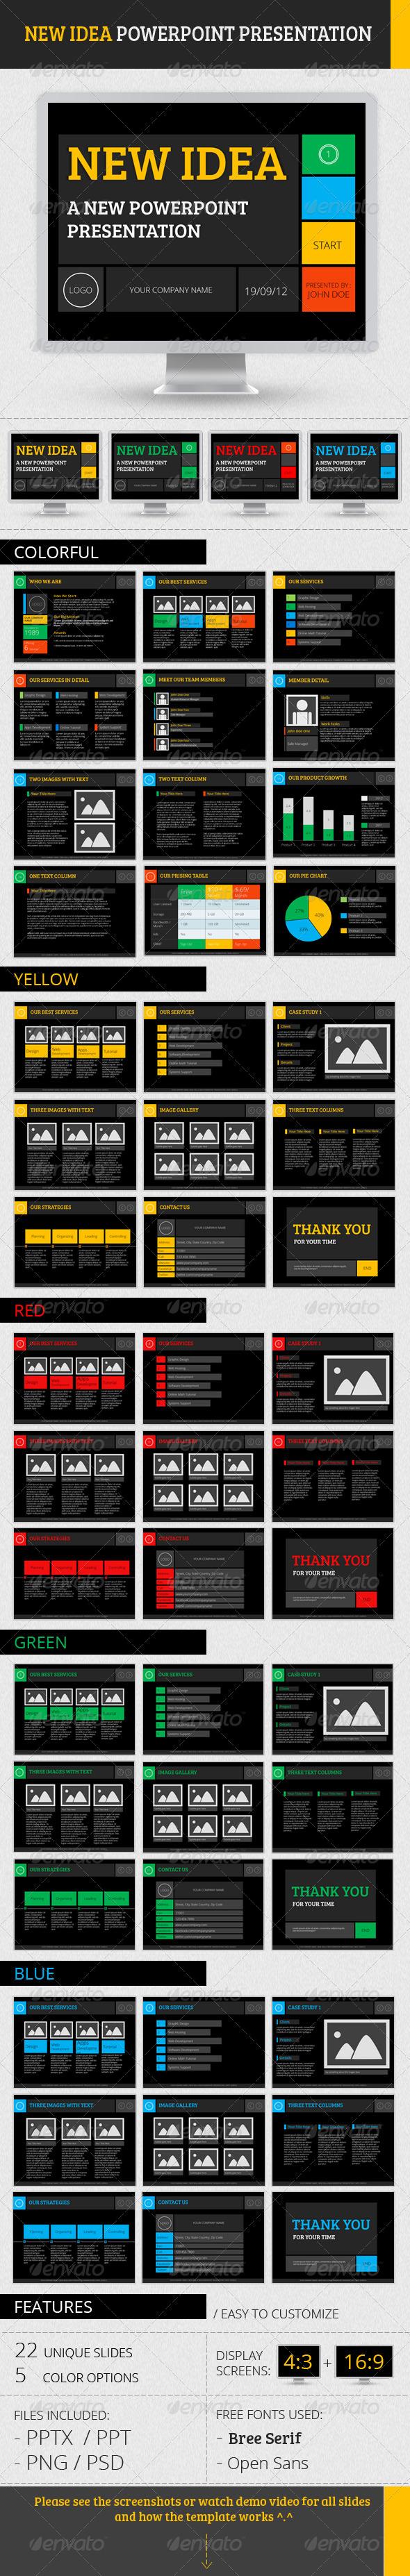 GraphicRiver New Idea PowerPoint Presentation 2611781